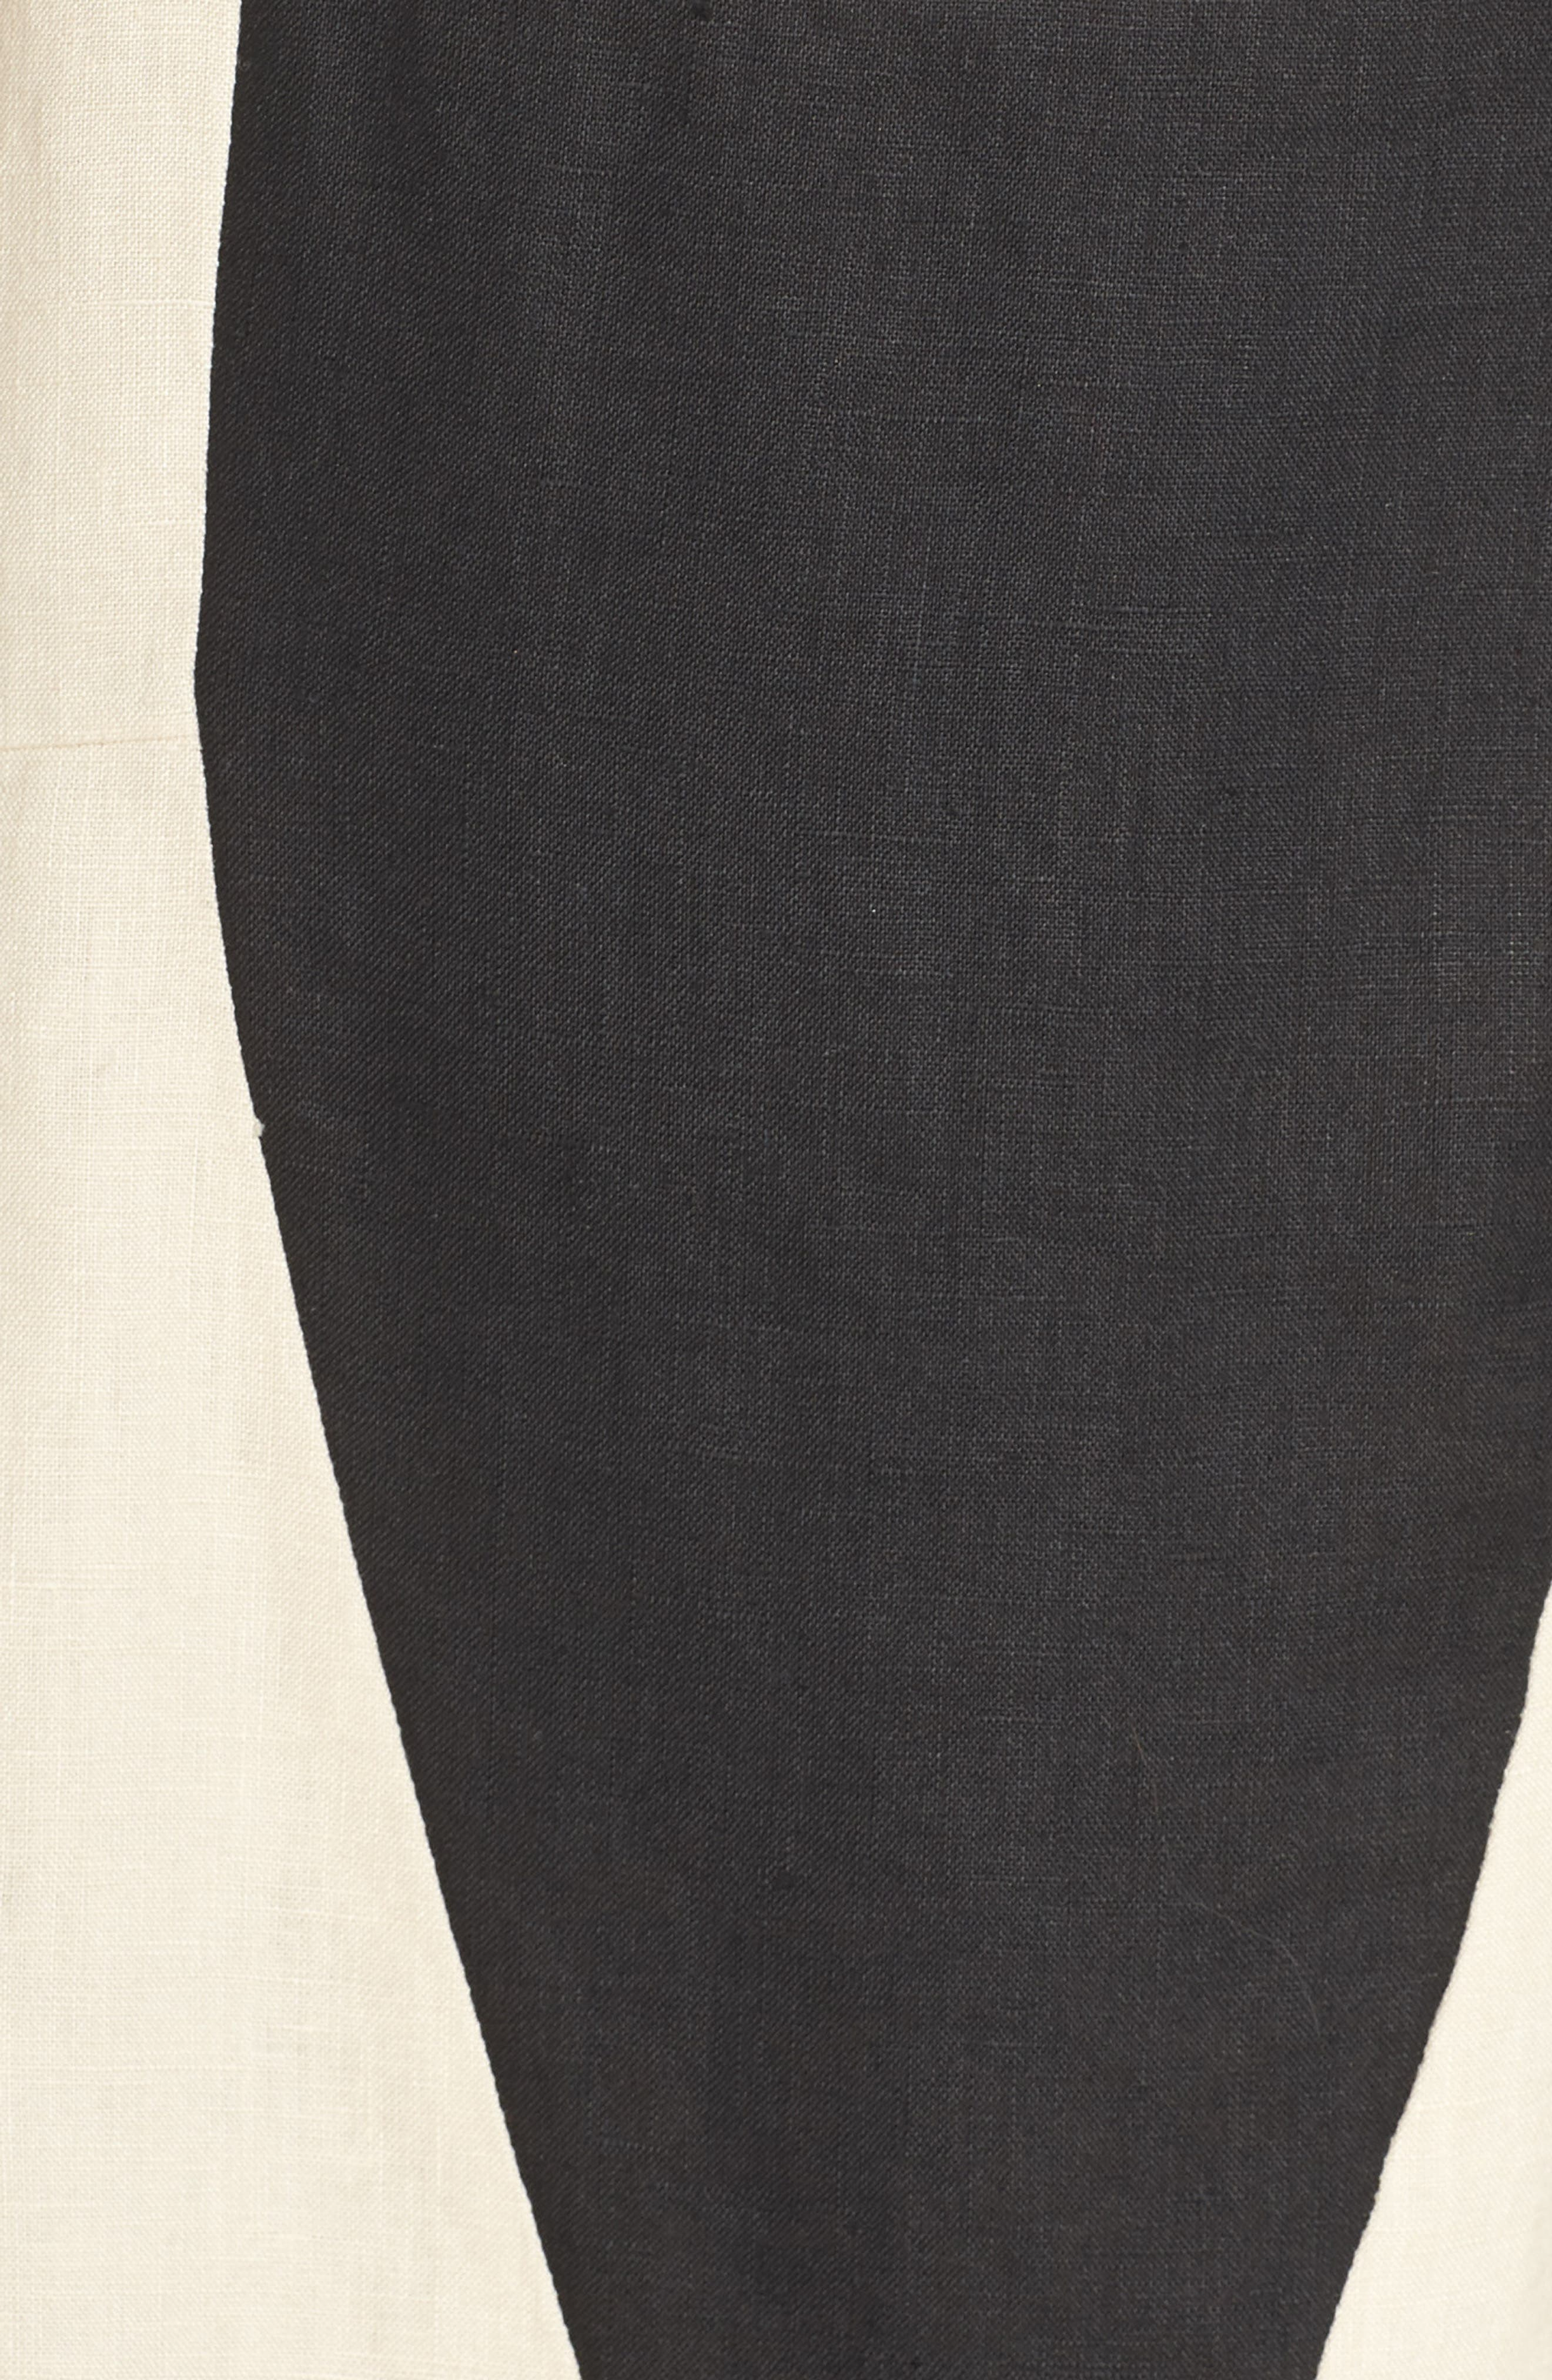 CAARA, Betha Colorblock Tie Back Dress, Alternate thumbnail 6, color, 001